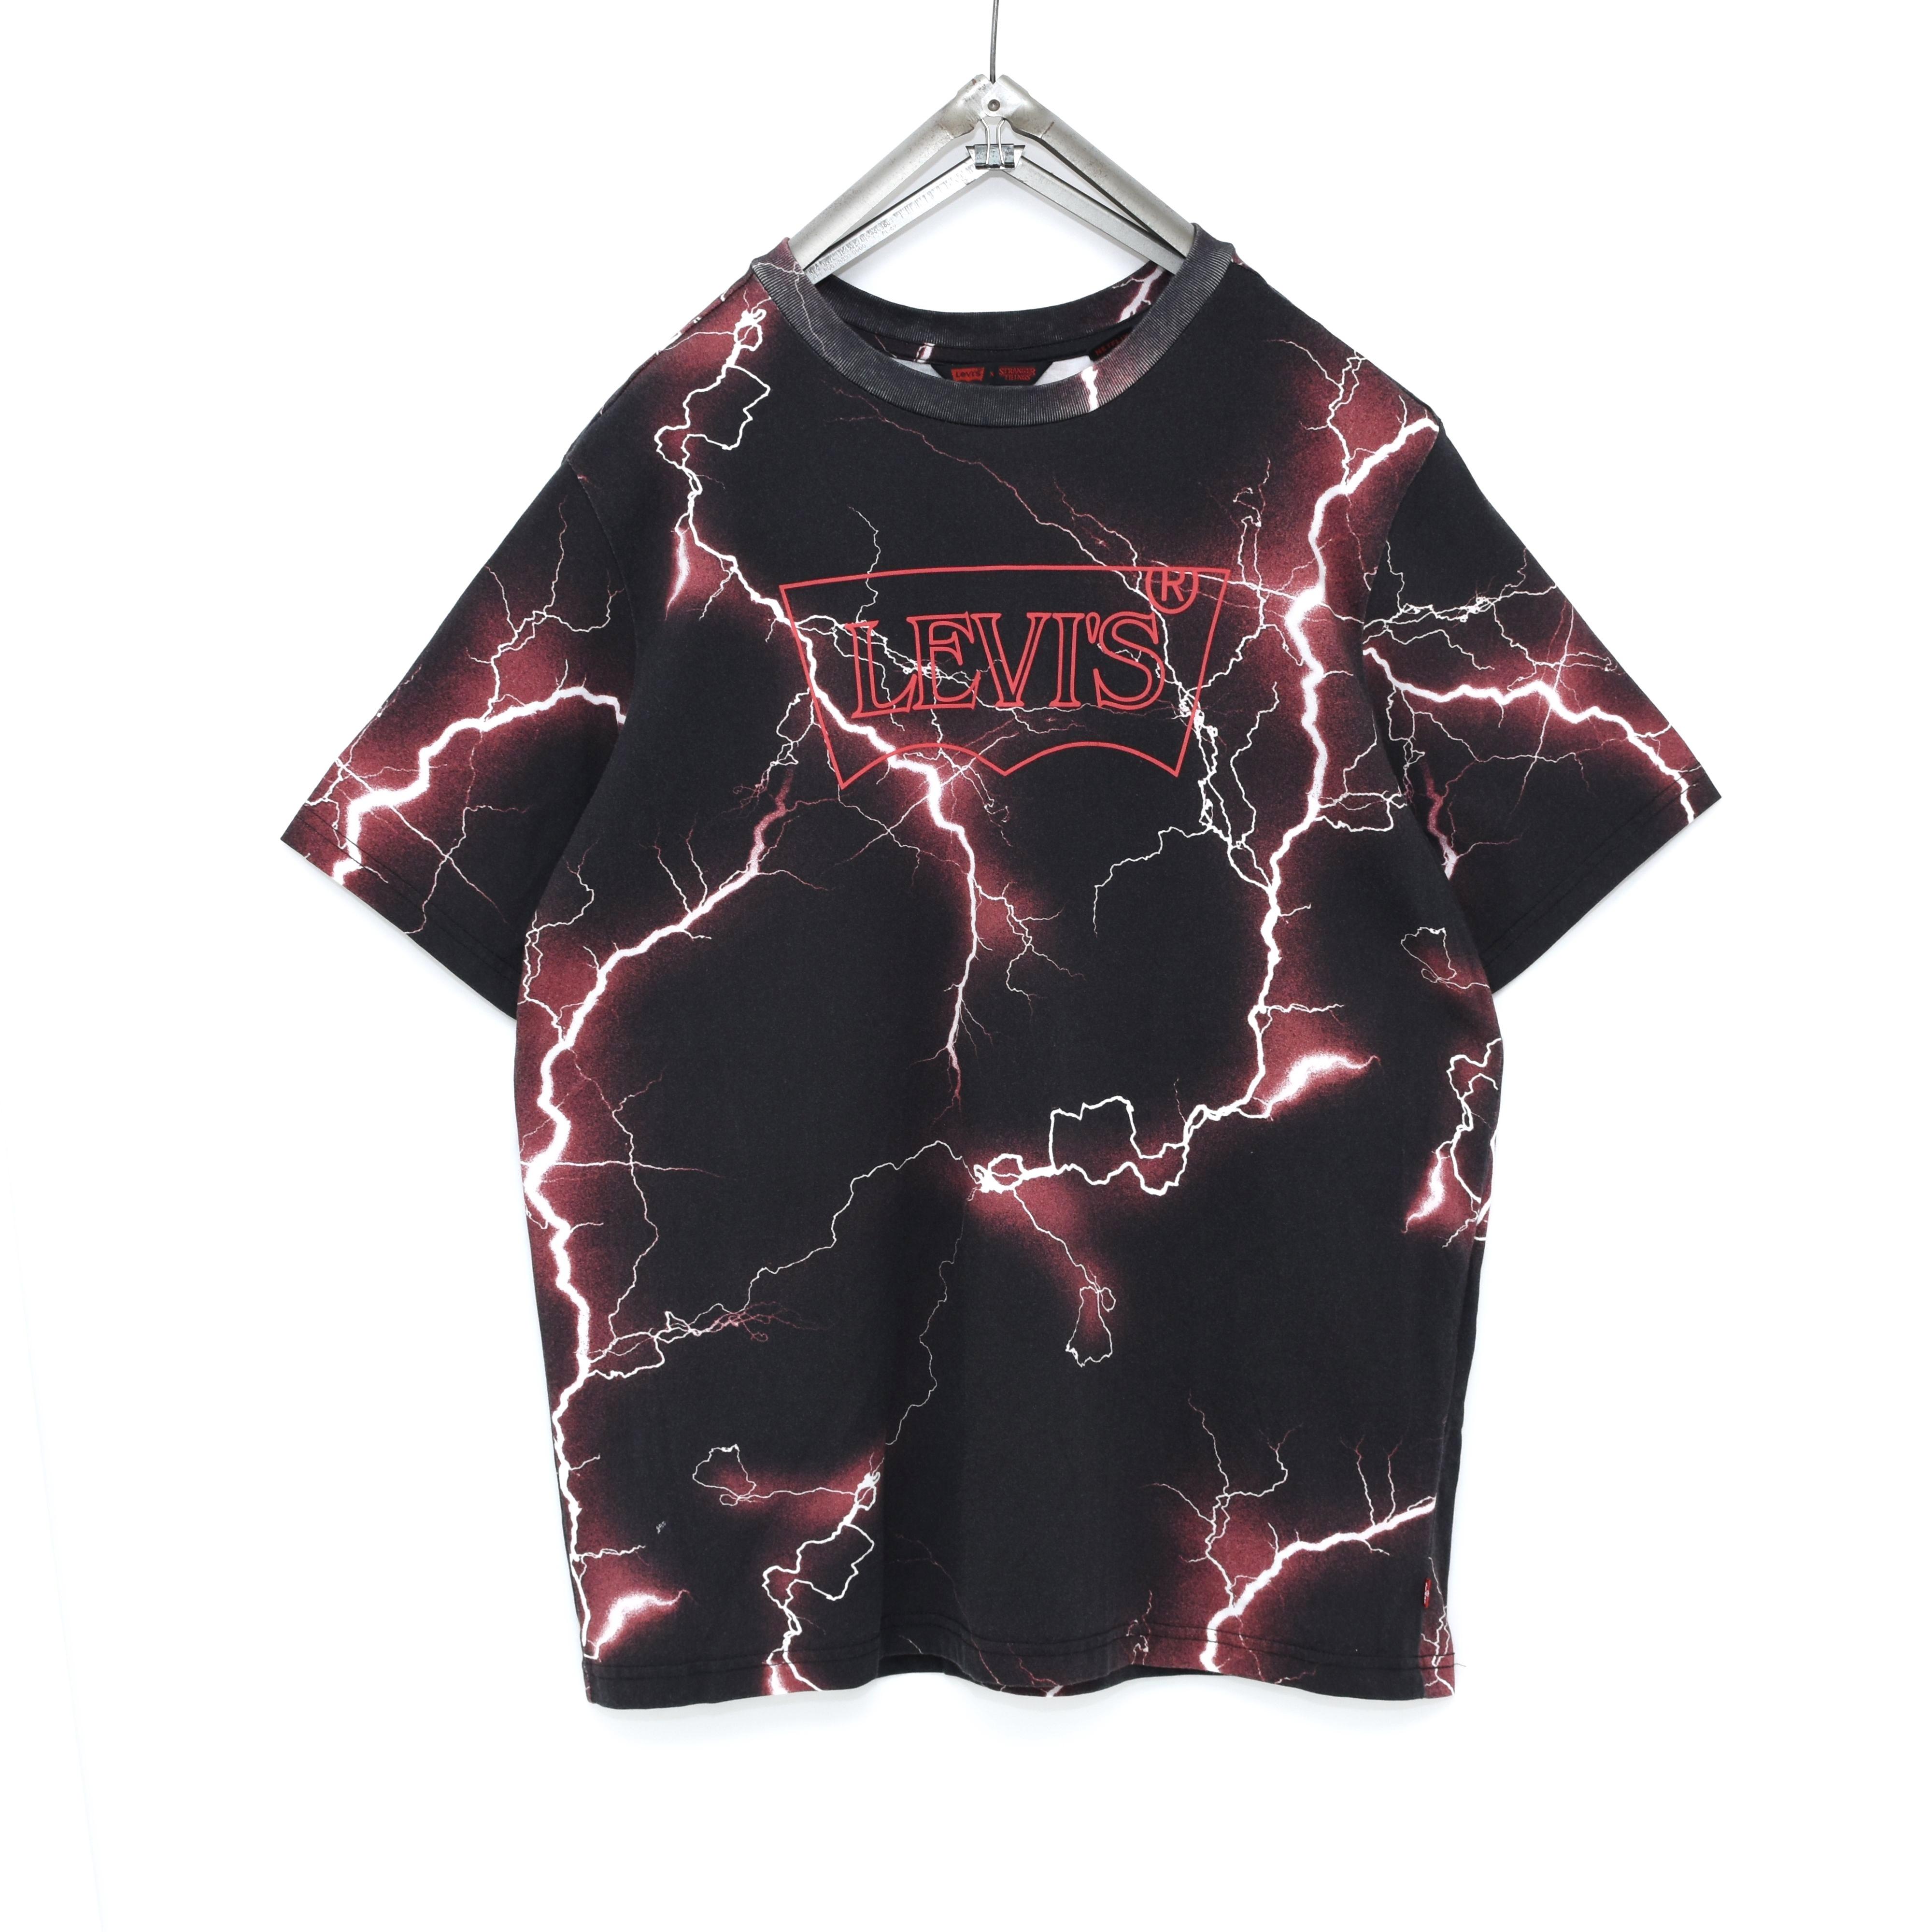 LEVI'S × Stranger Things サンダー柄 Tシャツ ストレンジャーシングス